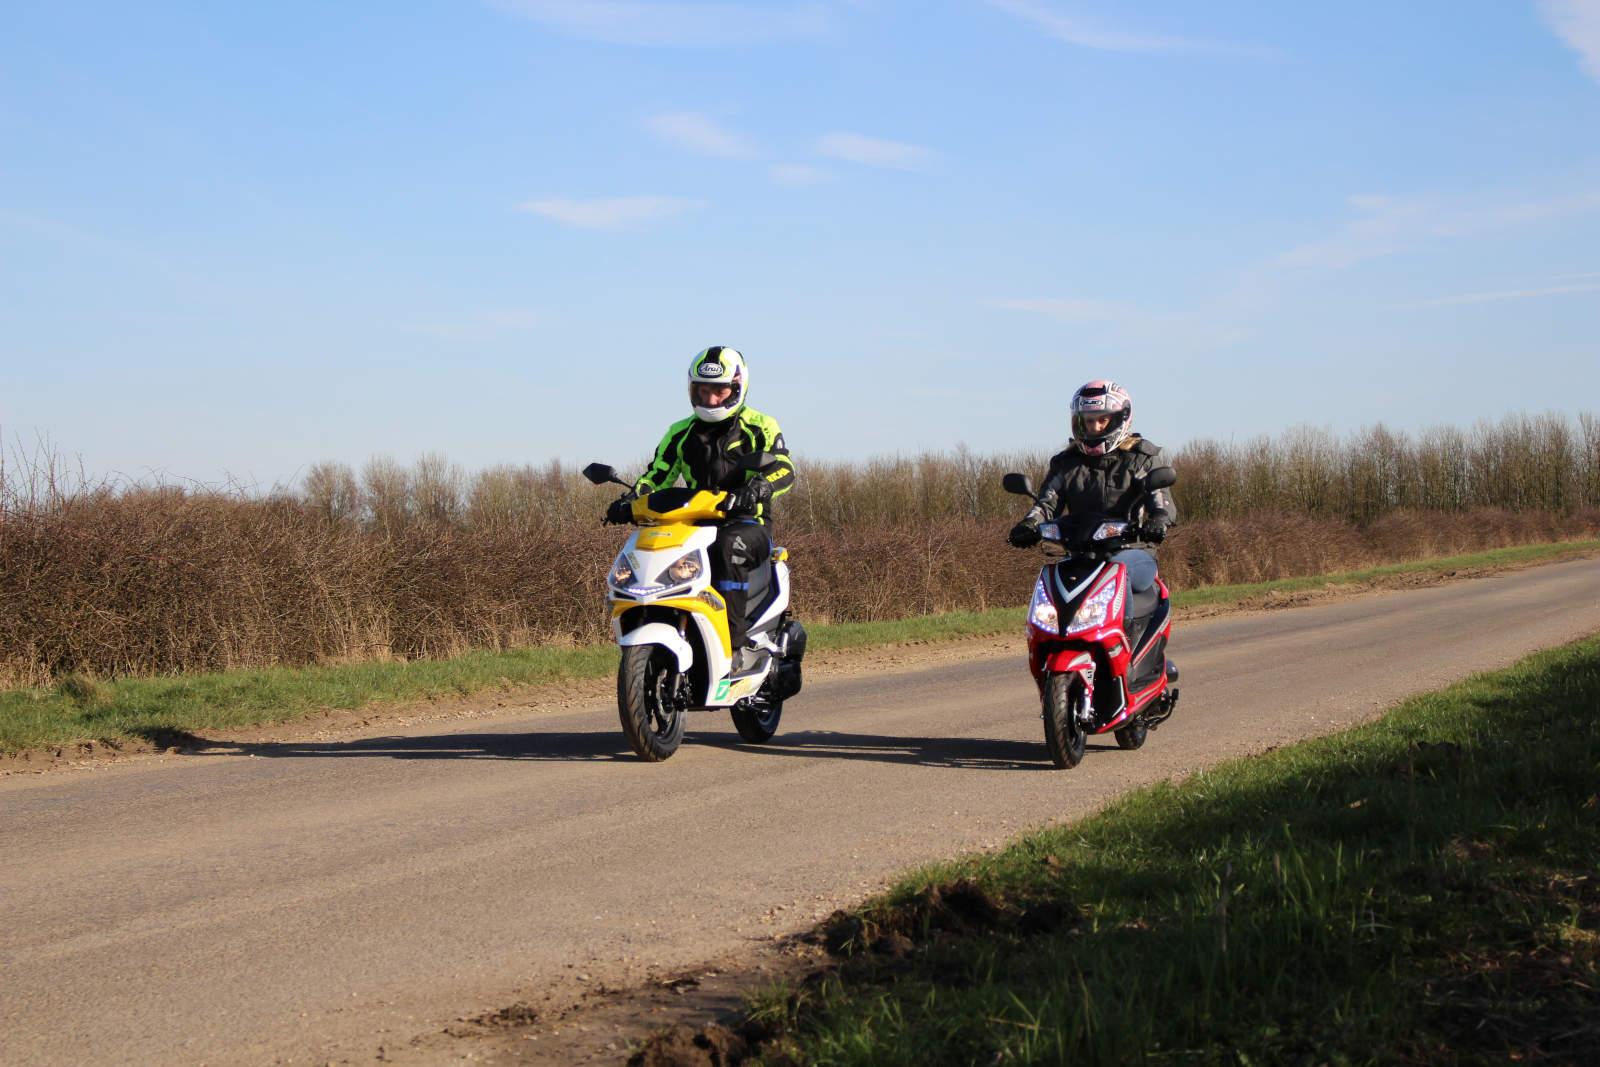 wk bikes training school offer